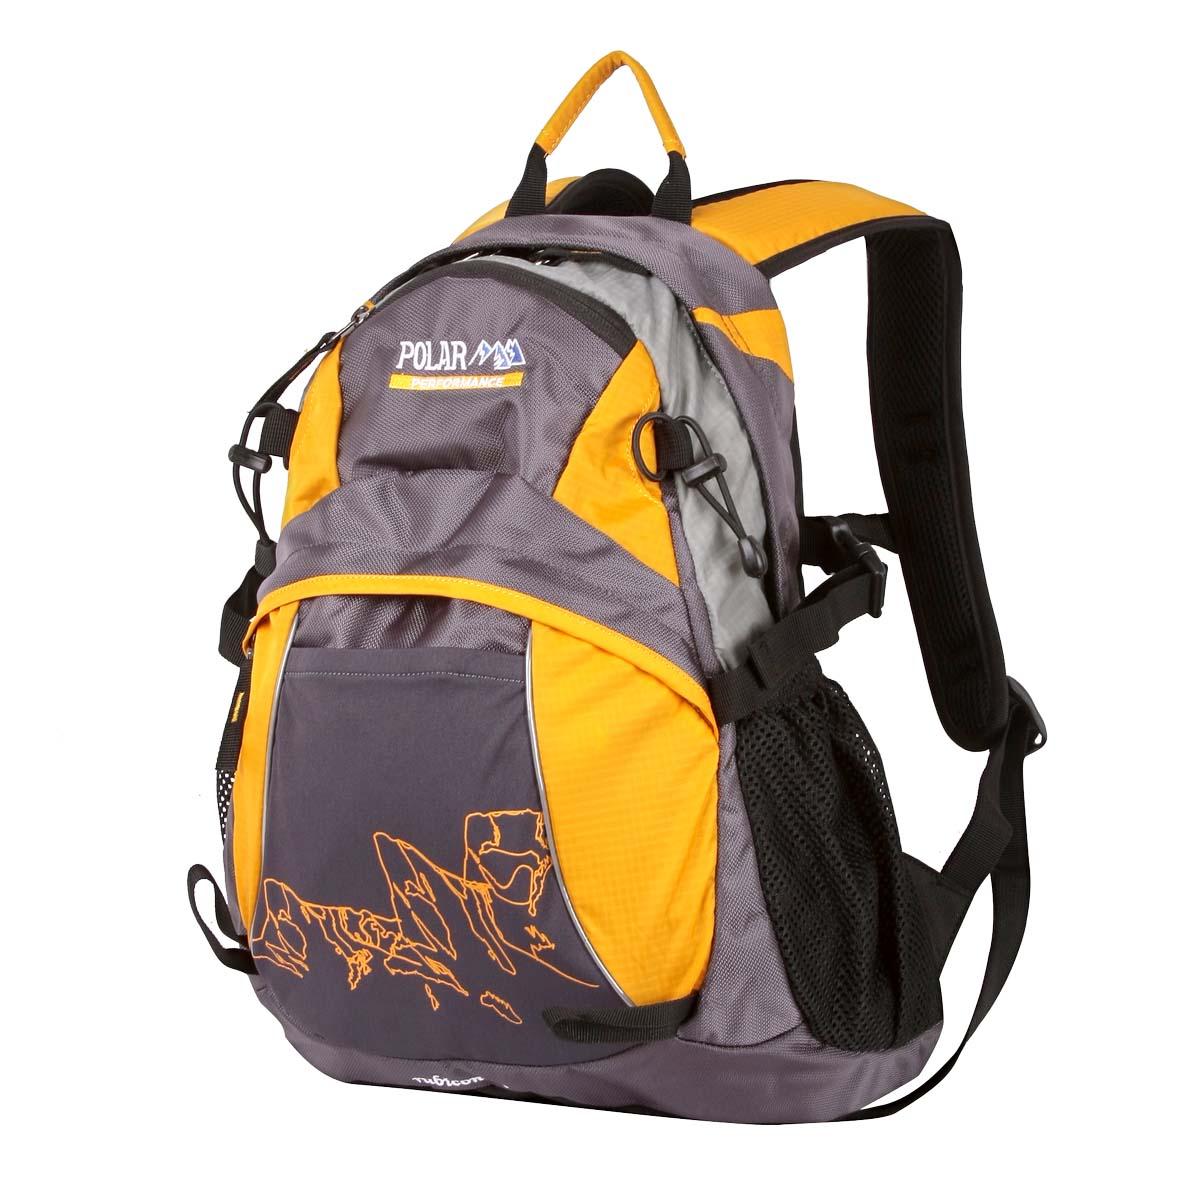 Рюкзак городской Polar, 21,5 л, цвет: желтый. П1563-03 рюкзак polar polar po001buawnf9